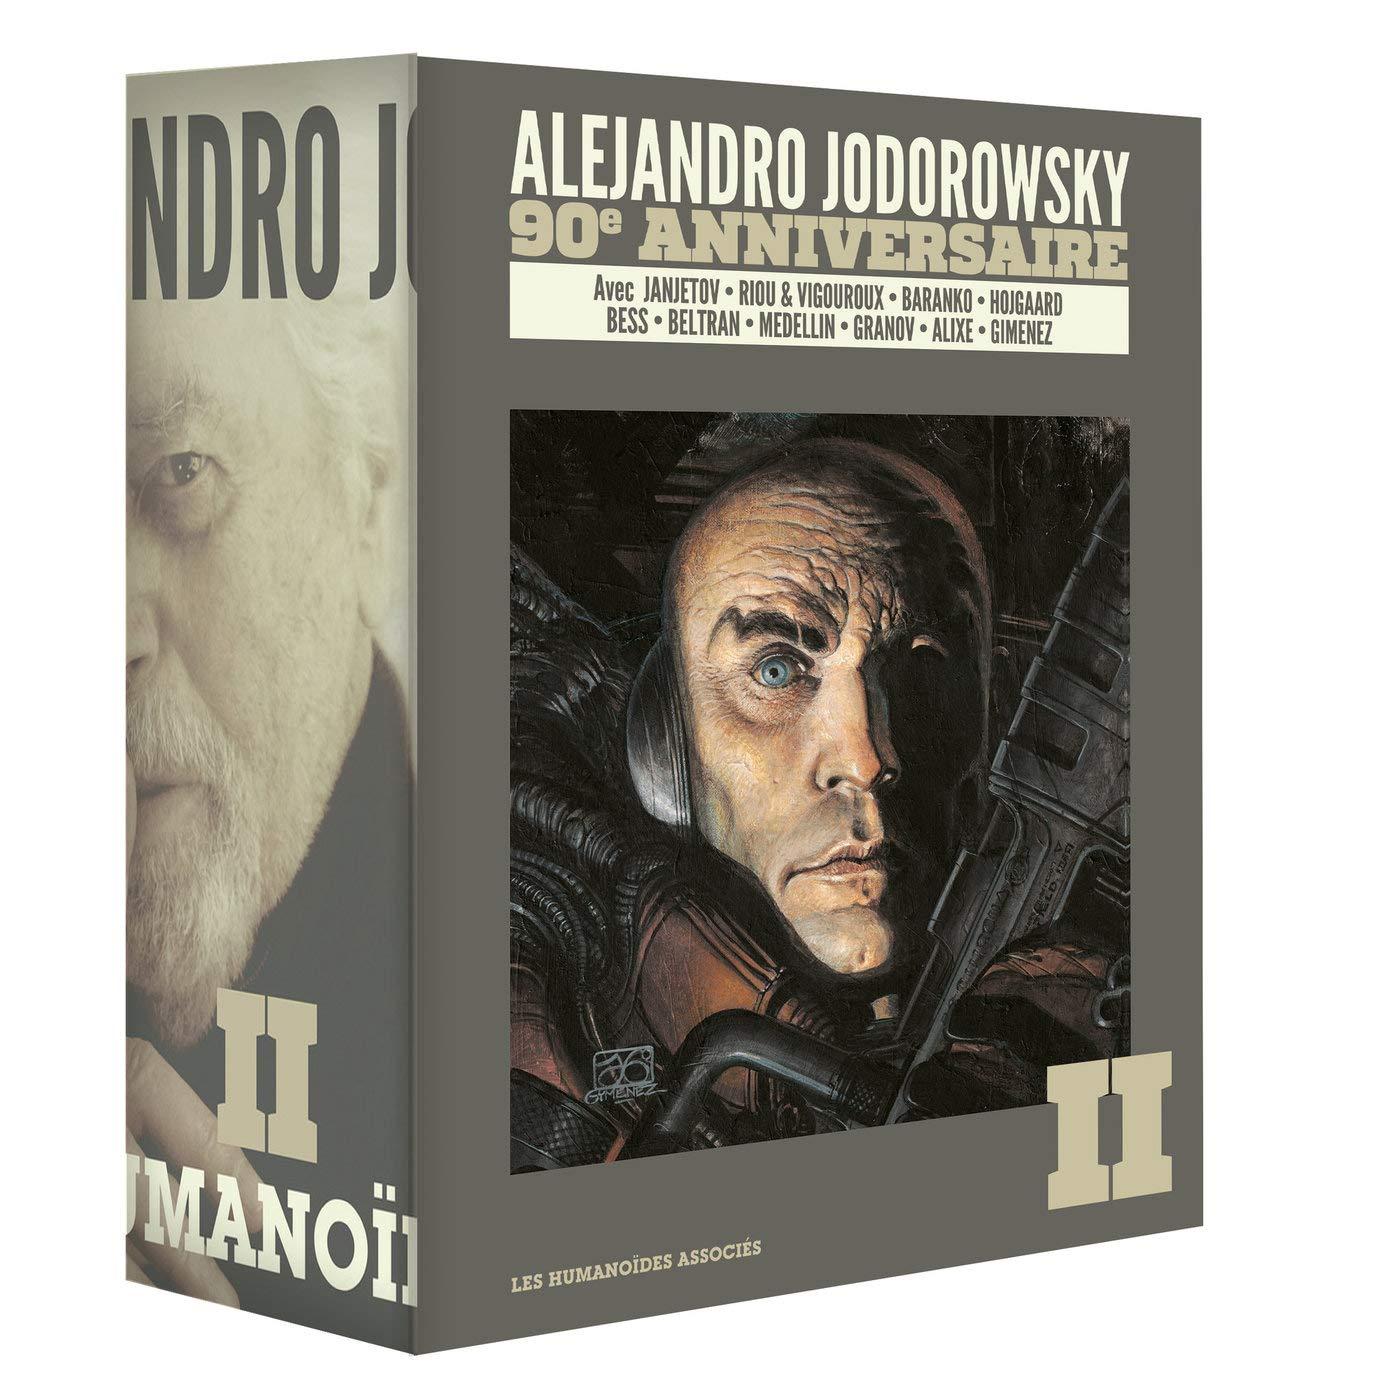 Alejandro Jodorowsky - 90ème anniversaire 2 - Coffret 2